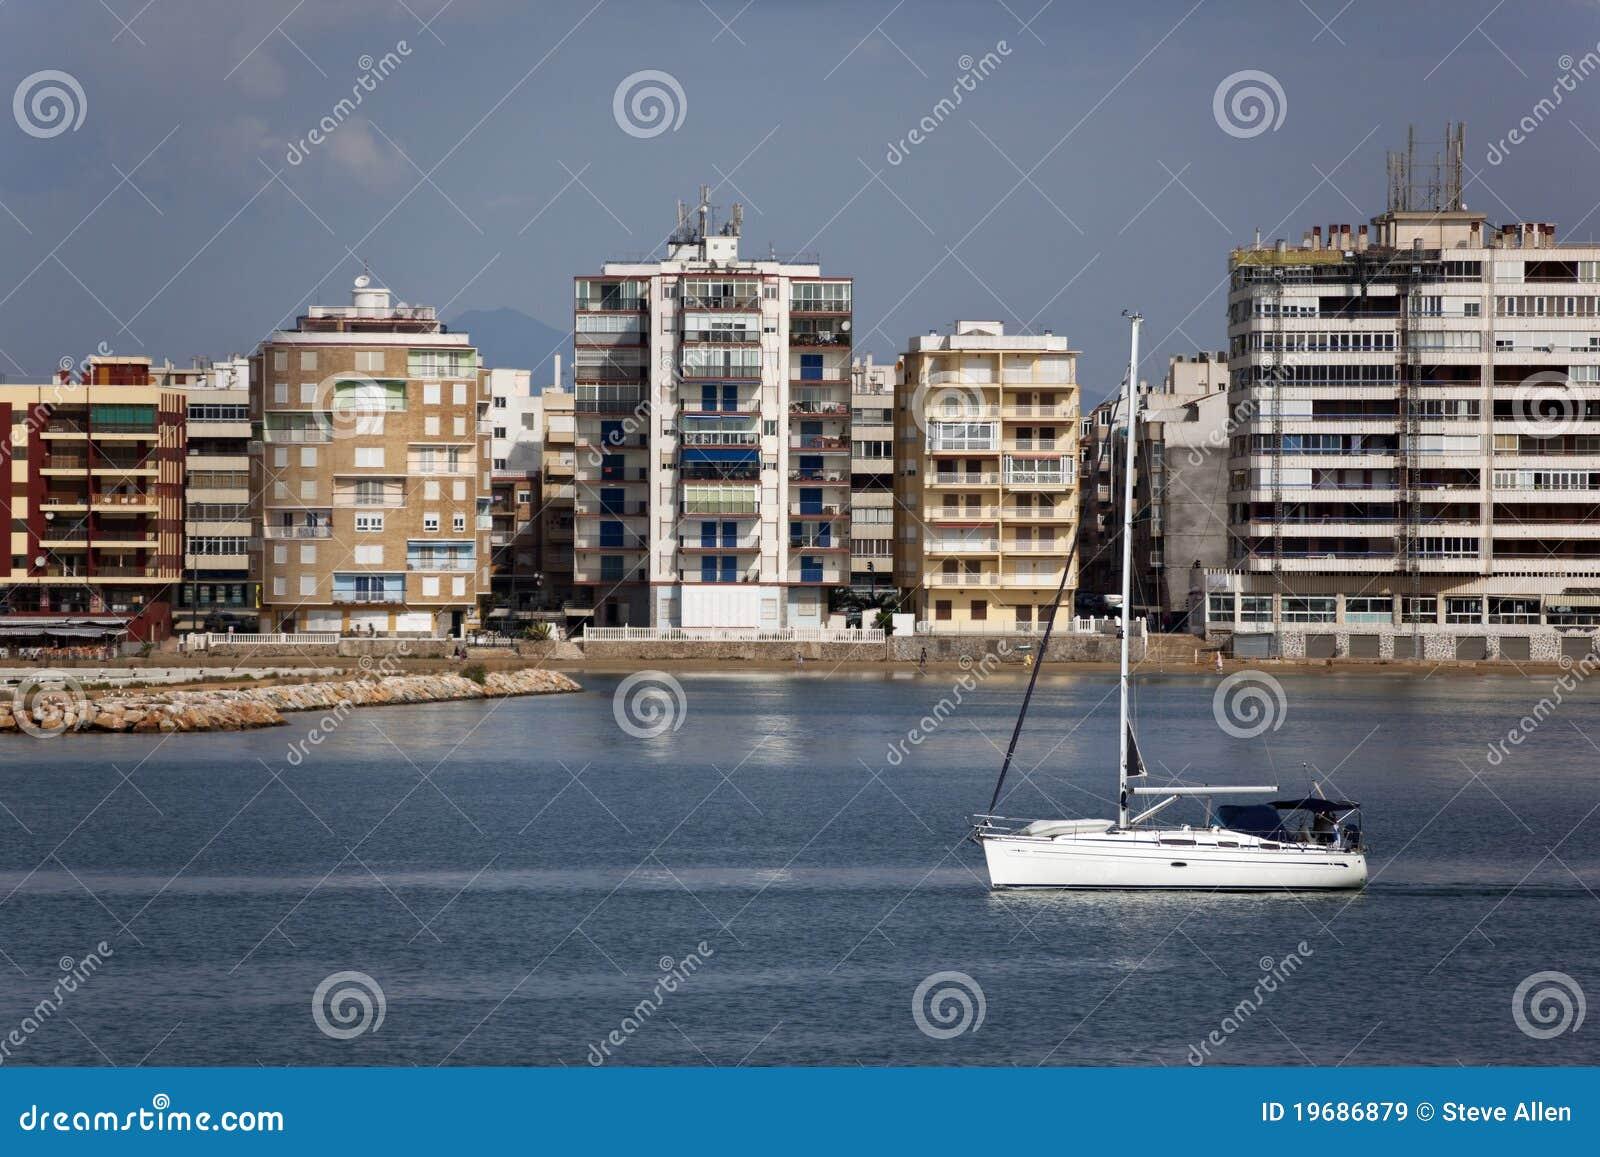 Torrevieja costa blanca spain royalty free stock - Z yachting torrevieja ...